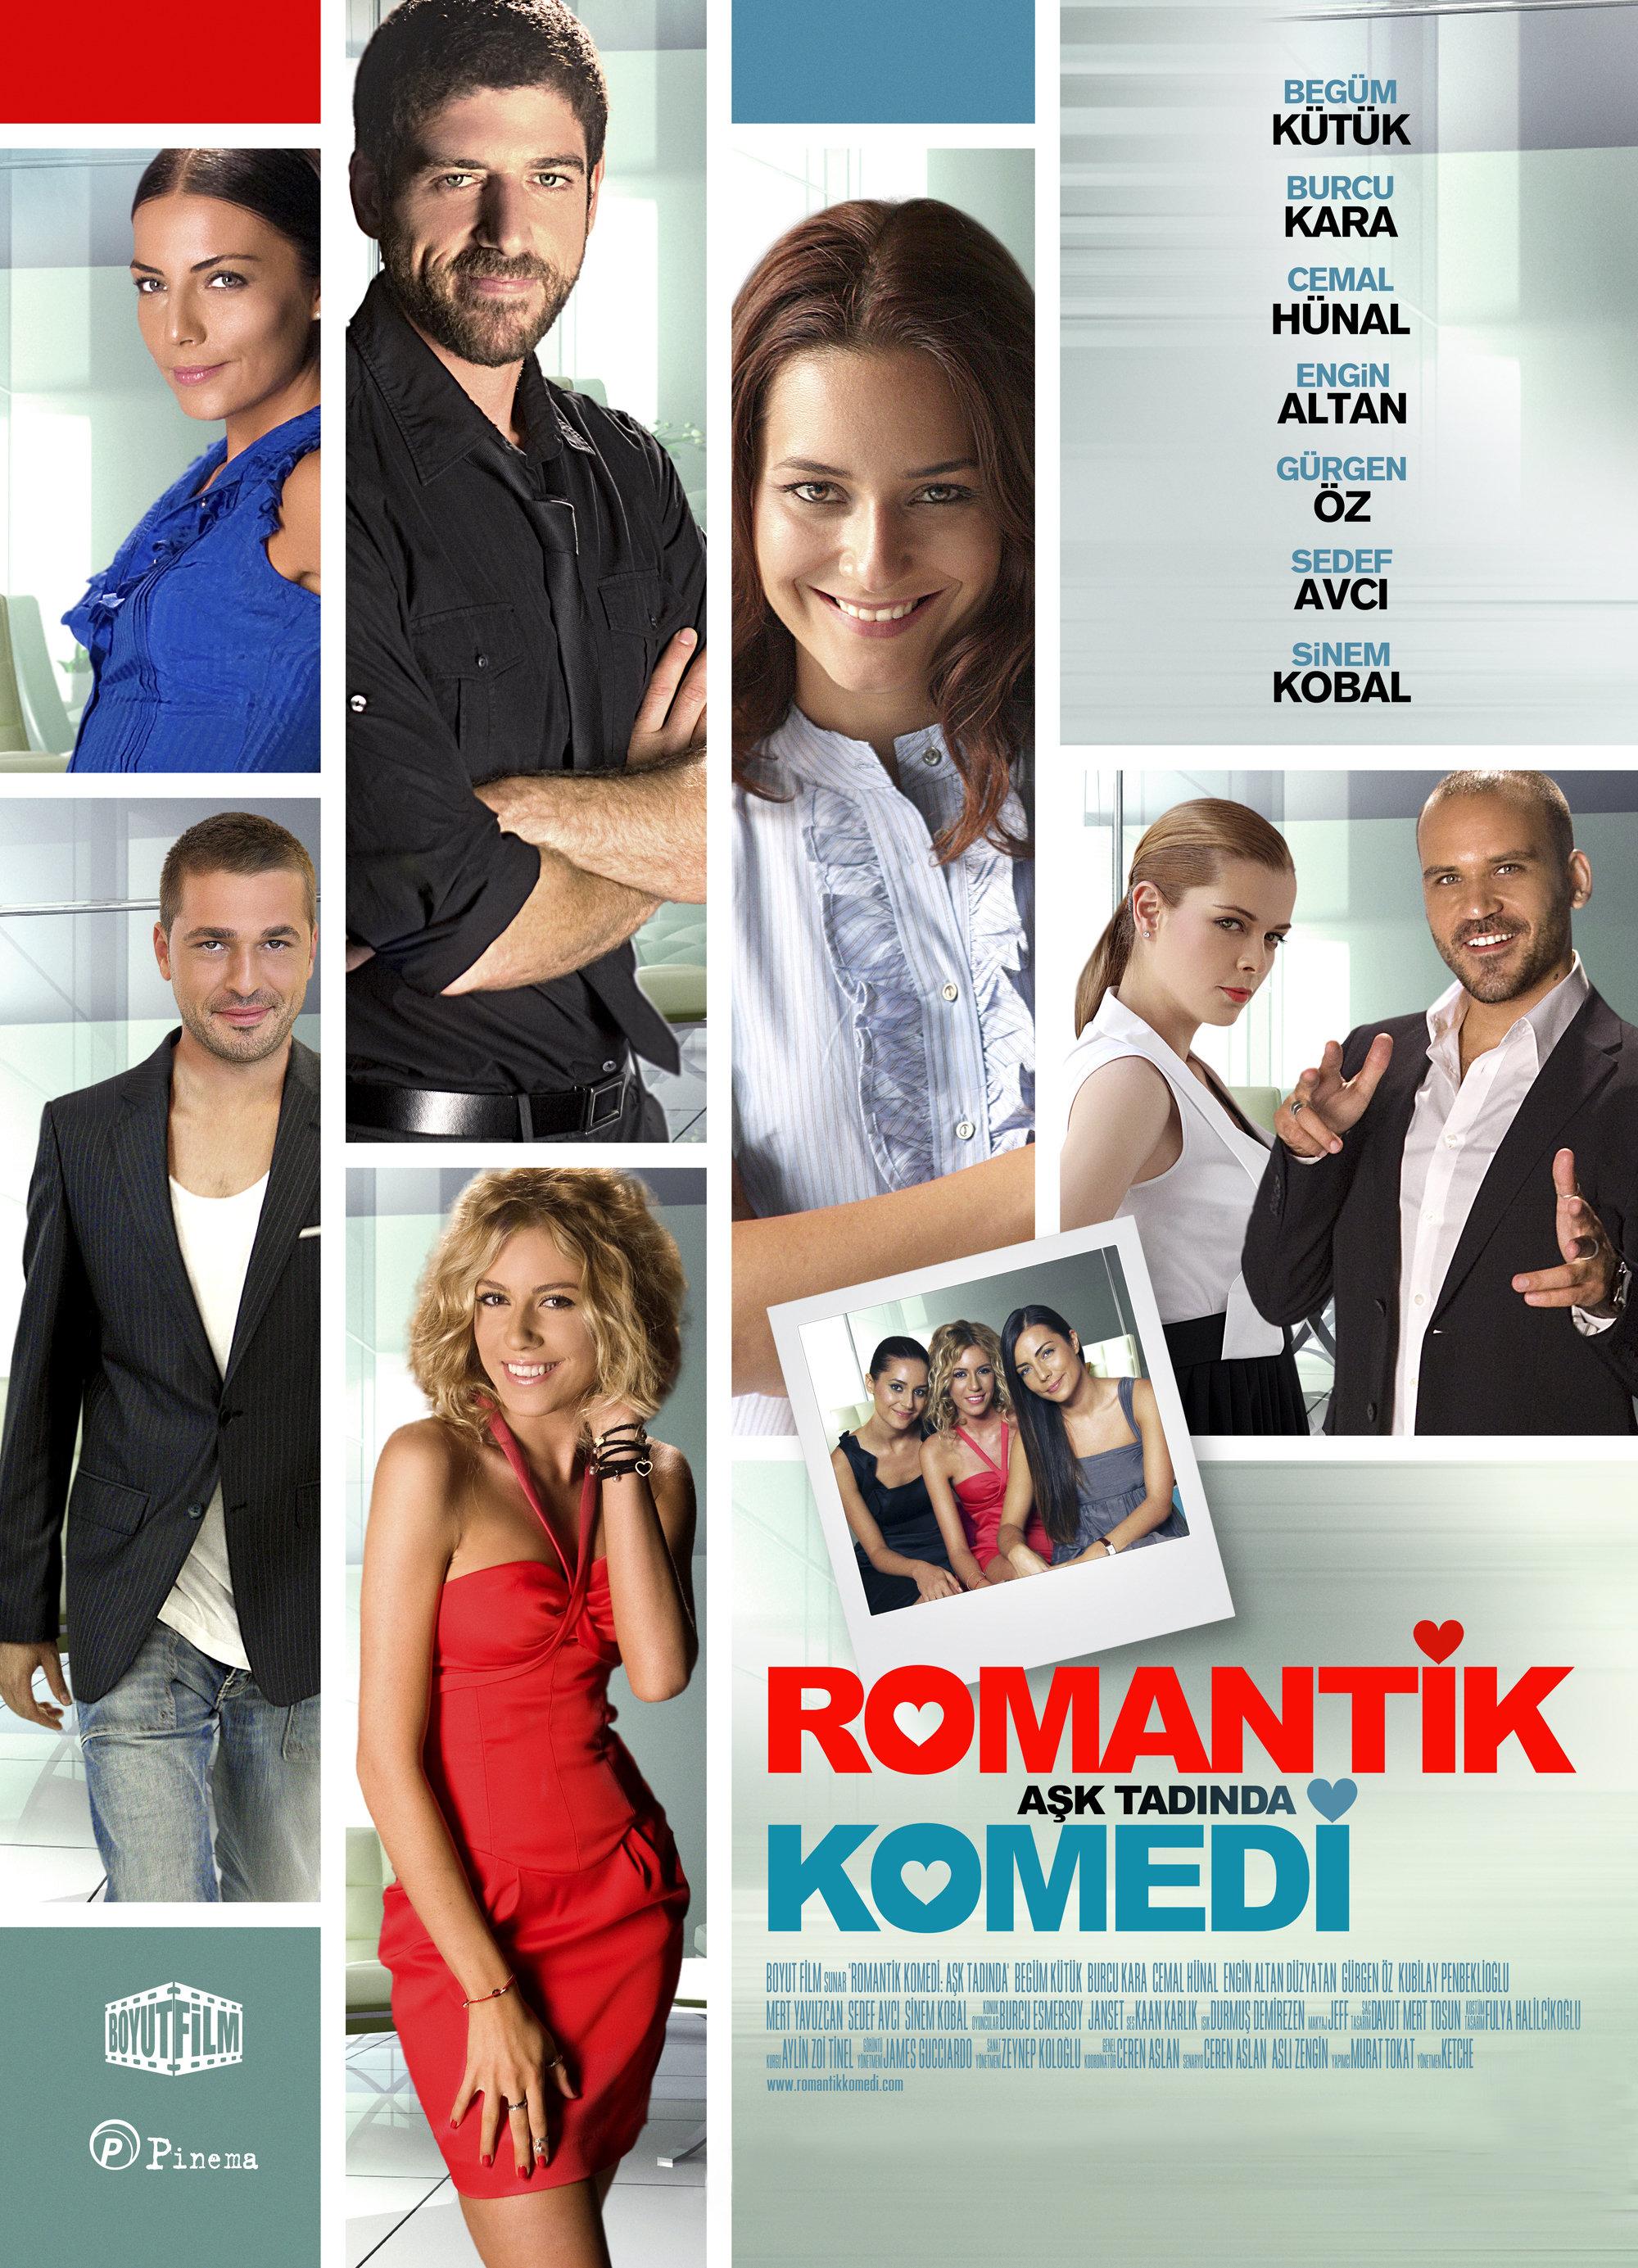 Romantik Komedi (2010)   IMDb